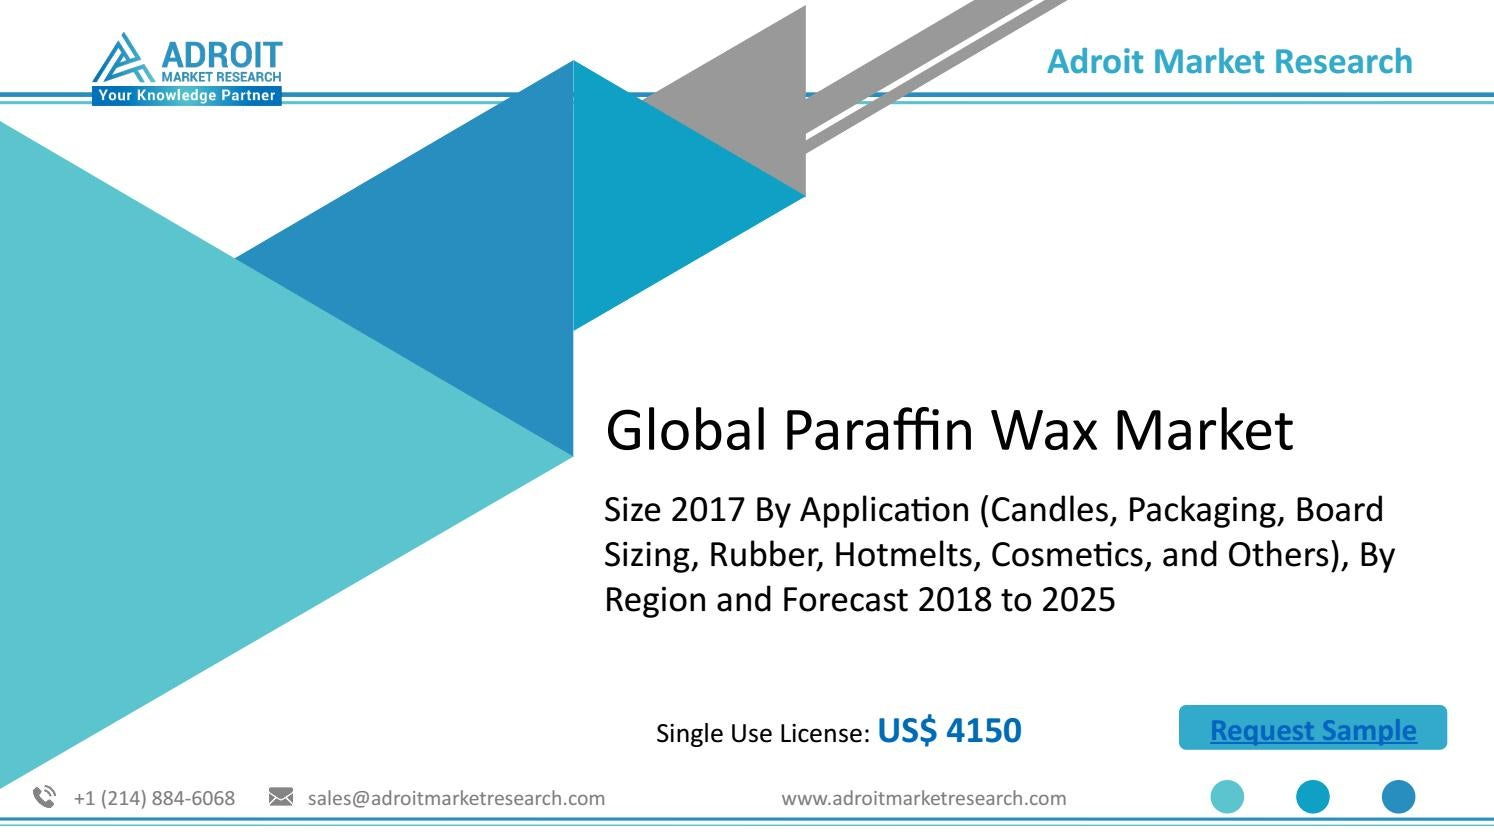 Paraffin Wax Market 2018: Research, Future Scope, Forecast